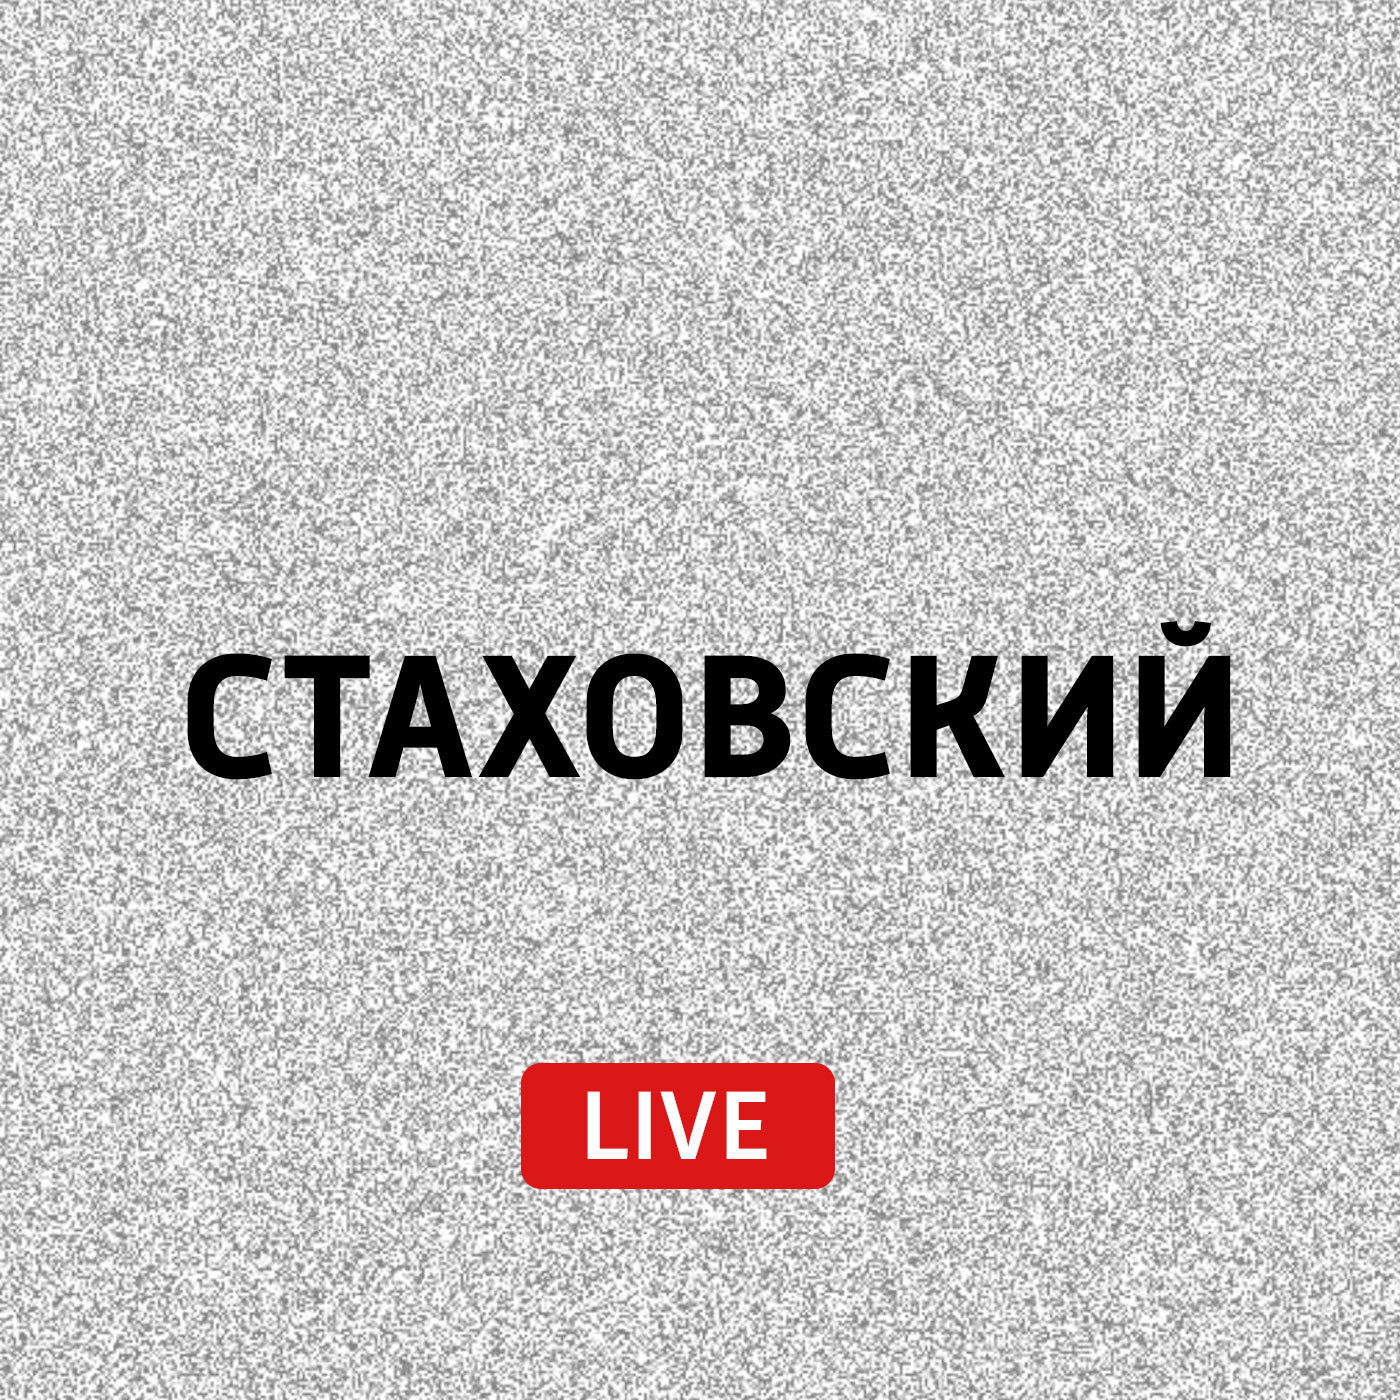 Евгений Стаховский Сиеста евгений стаховский хаю хай